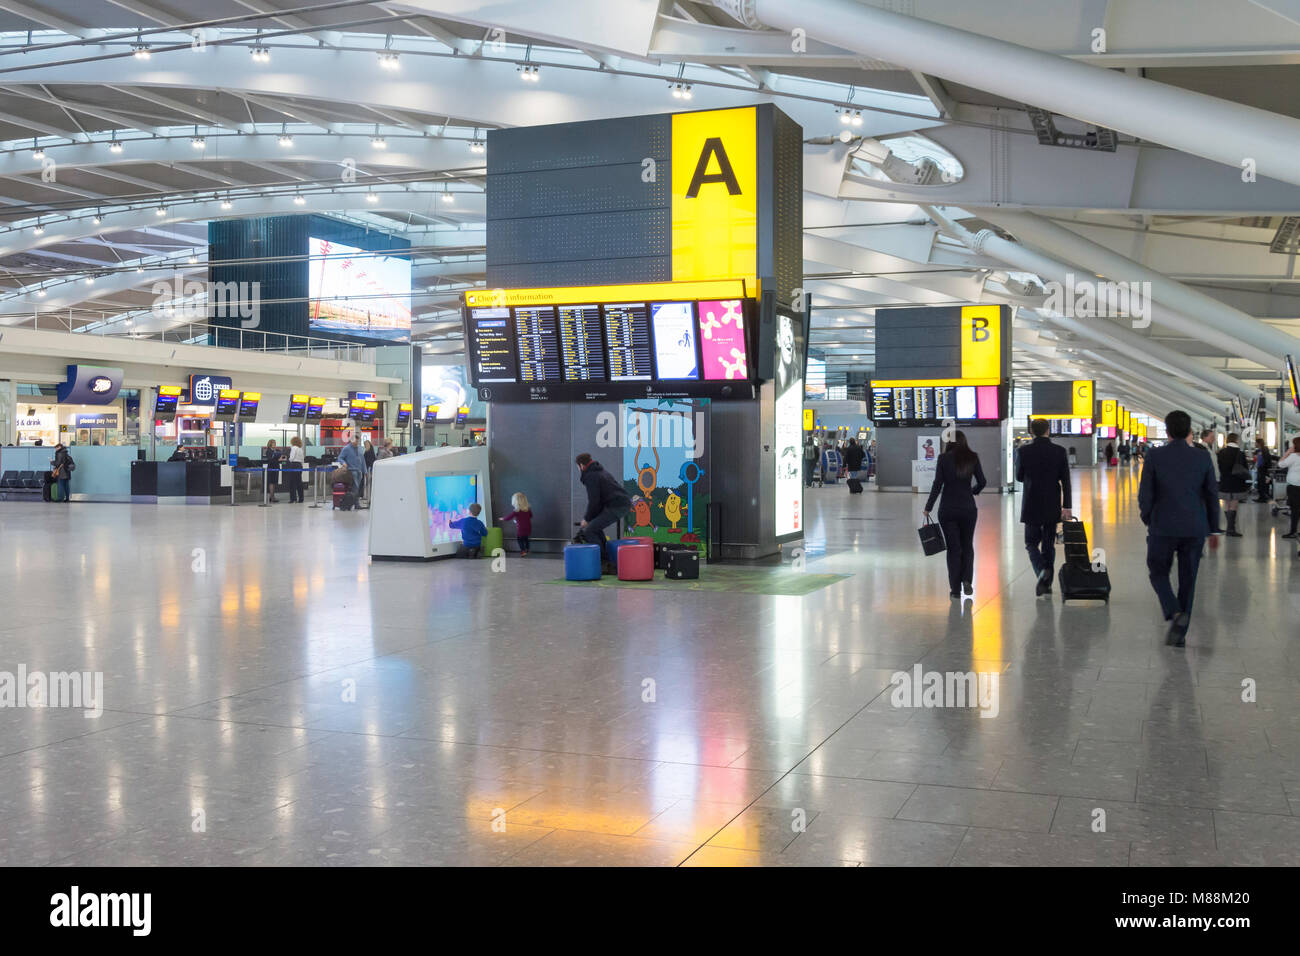 Departure level interior, Terminal 5, Heathrow Airport. London Borough of Hounslow, Greater London, England, United - Stock Image